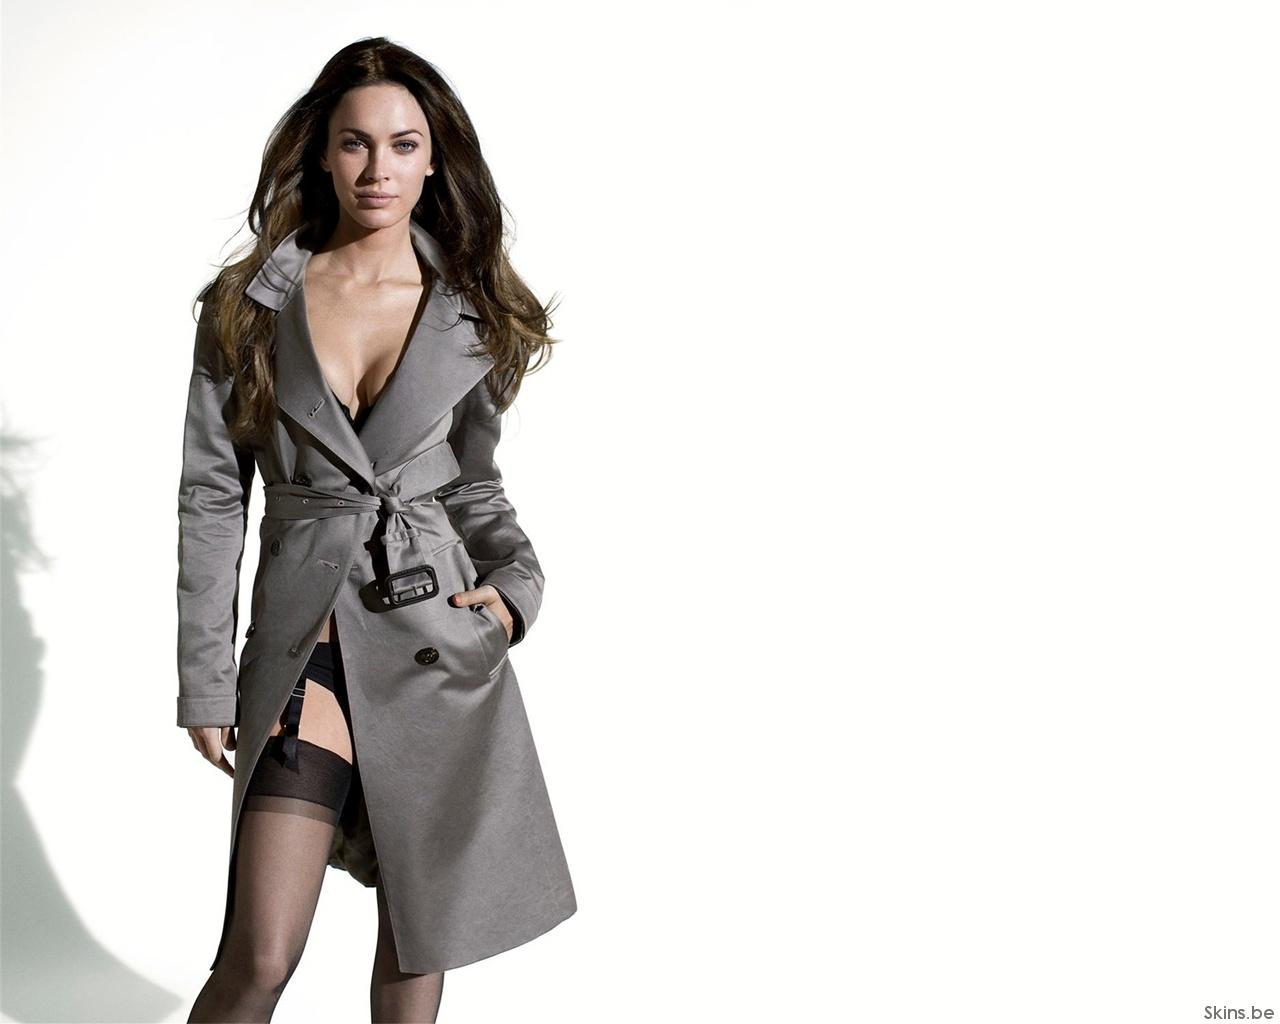 Megan Fox desktop wallpaper download in widescreen hd 36626 1280x1024